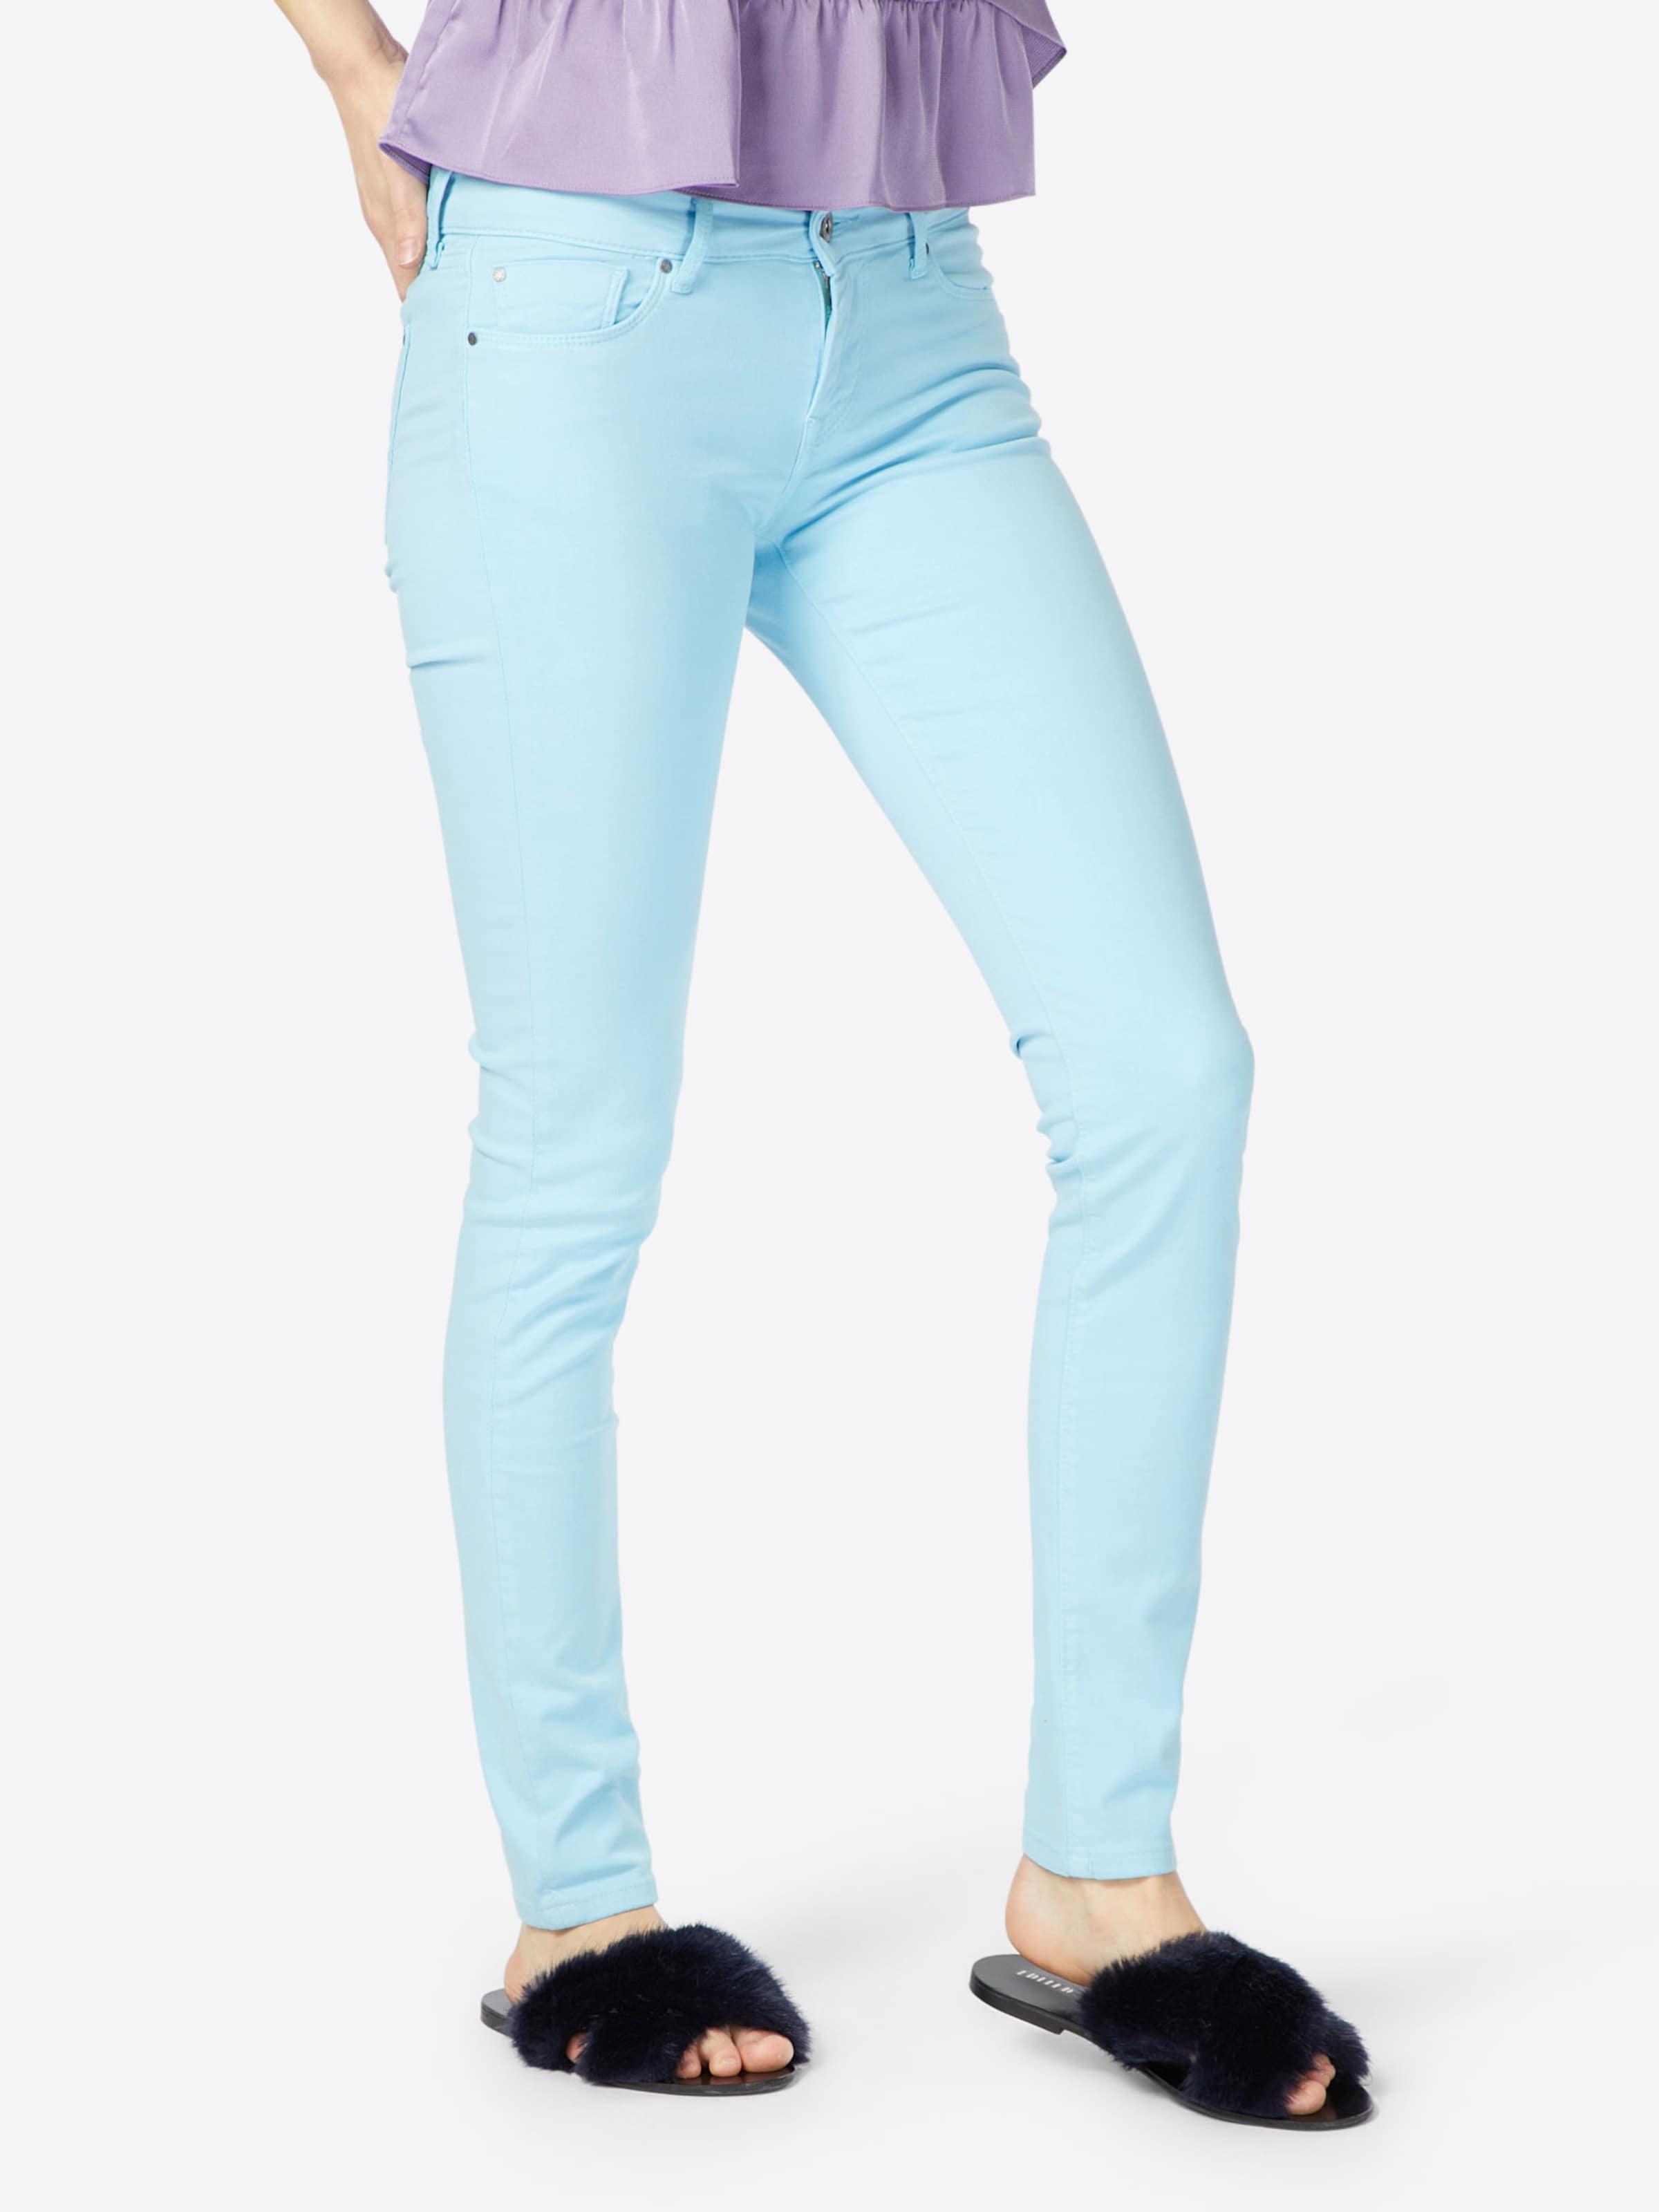 Pepe Jeans 'Soho' Skinny Jeans Limit Rabatt Auslass-Websites Erscheinungsdaten Verkauf Online QdrR0rgB